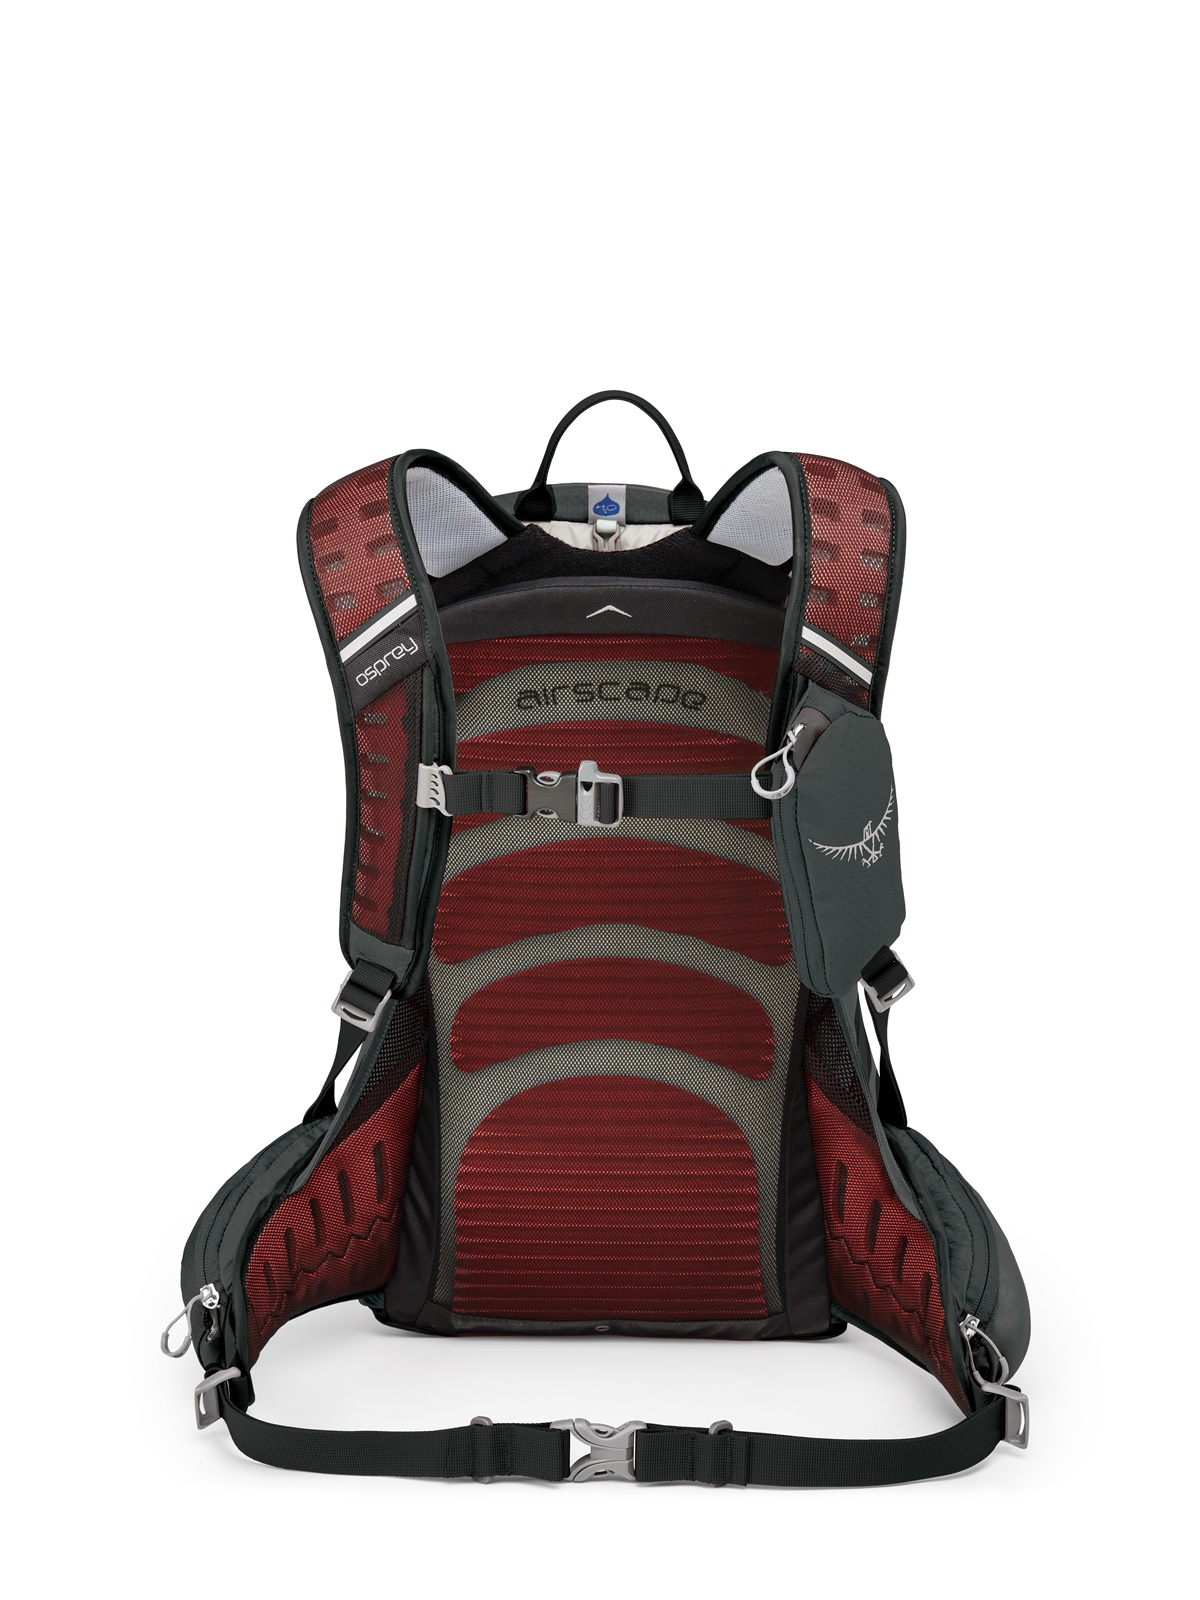 83422abdaf180 Plecak Osprey ESCAPIST 25